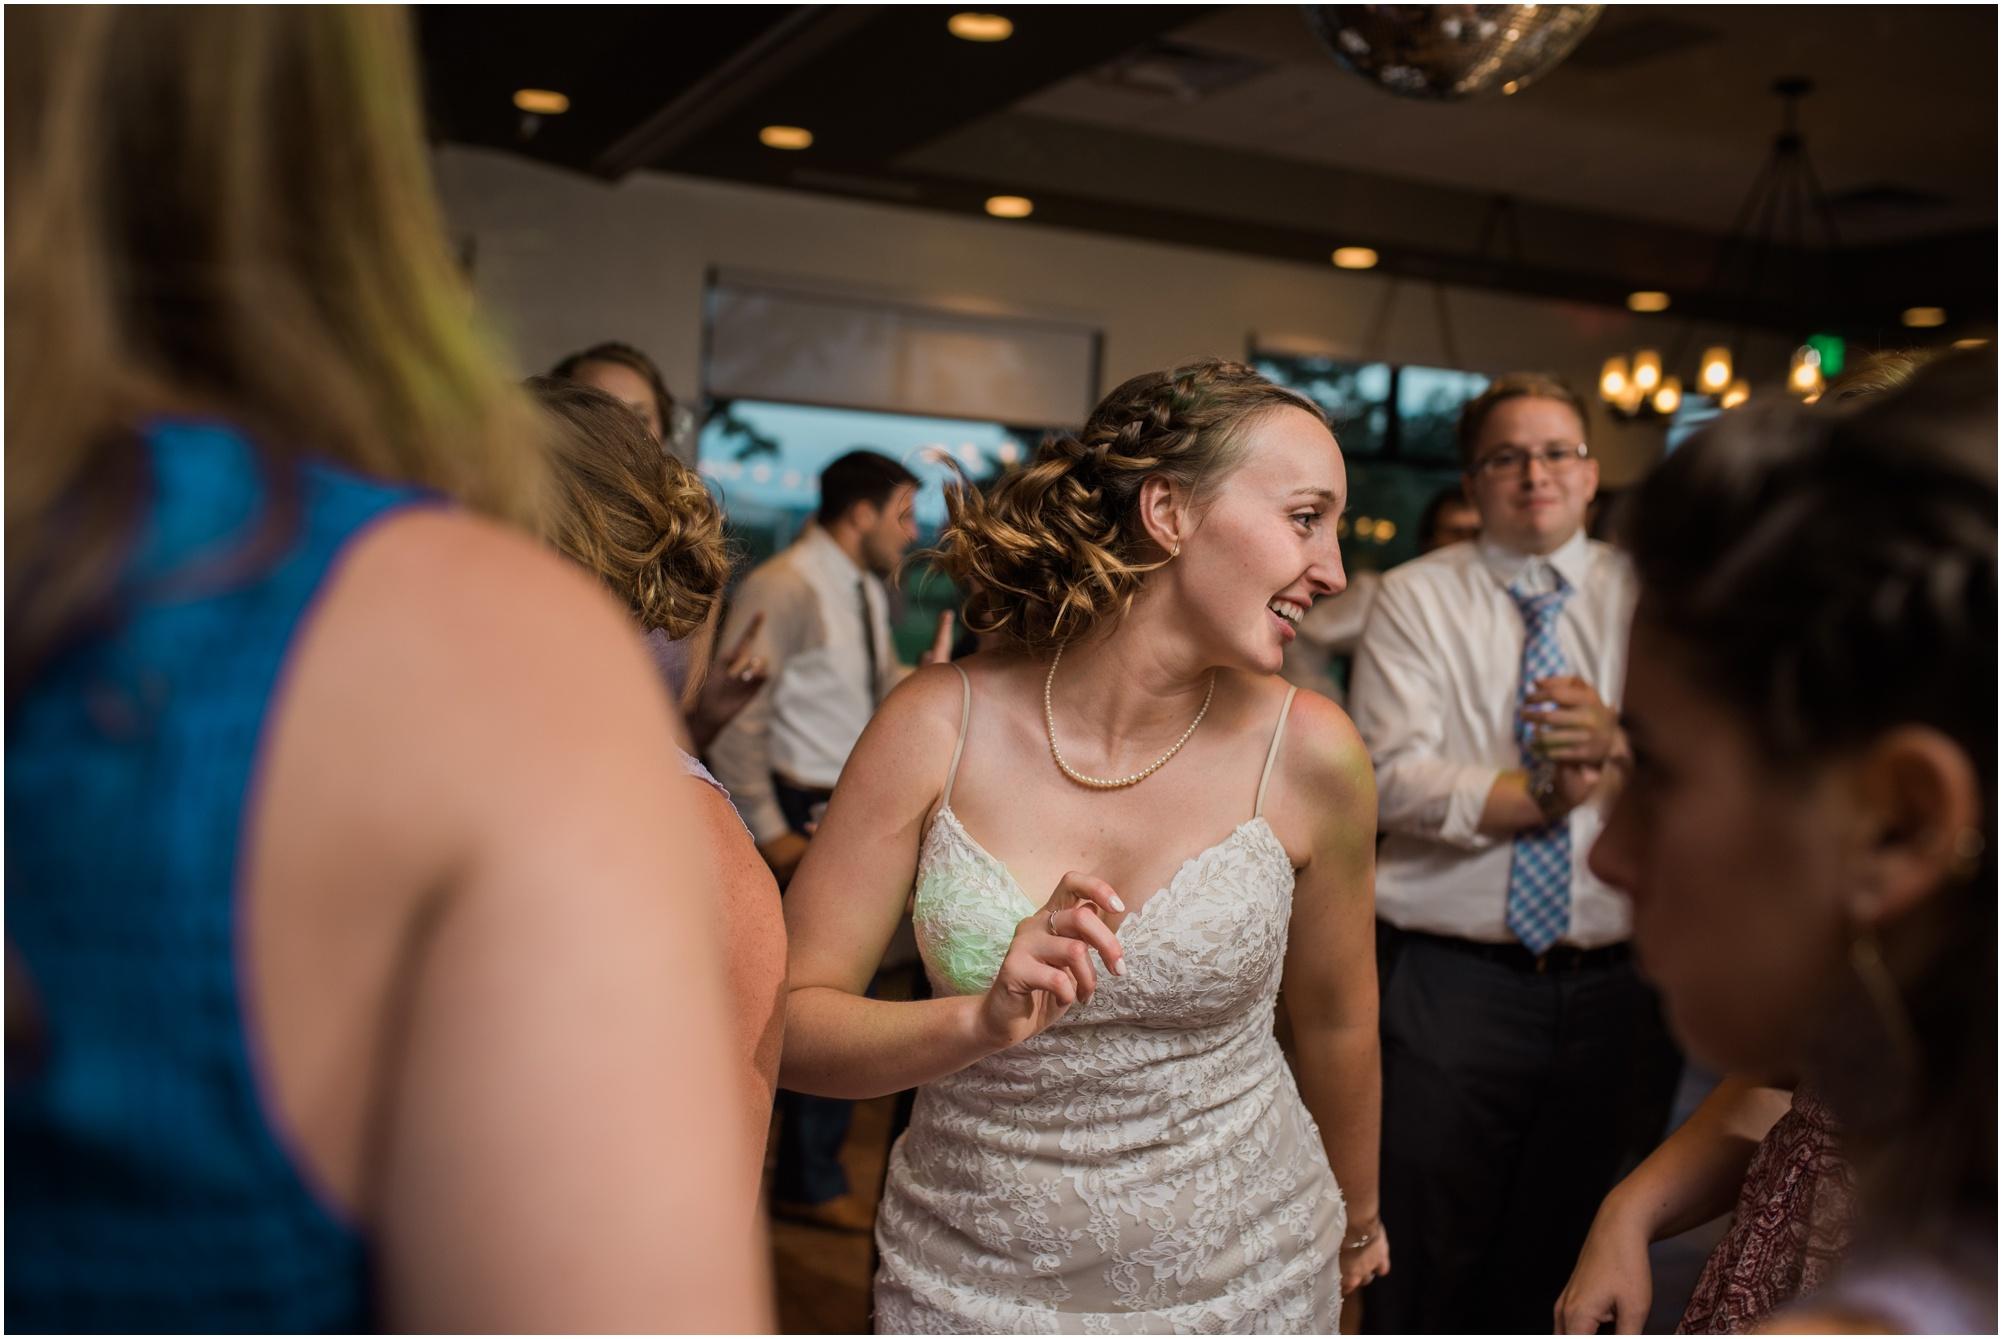 Wisconsin-Wedding-Photographer-Reedsburg-Country-Club-Kaela-and Matt-Wedding-989.jpg